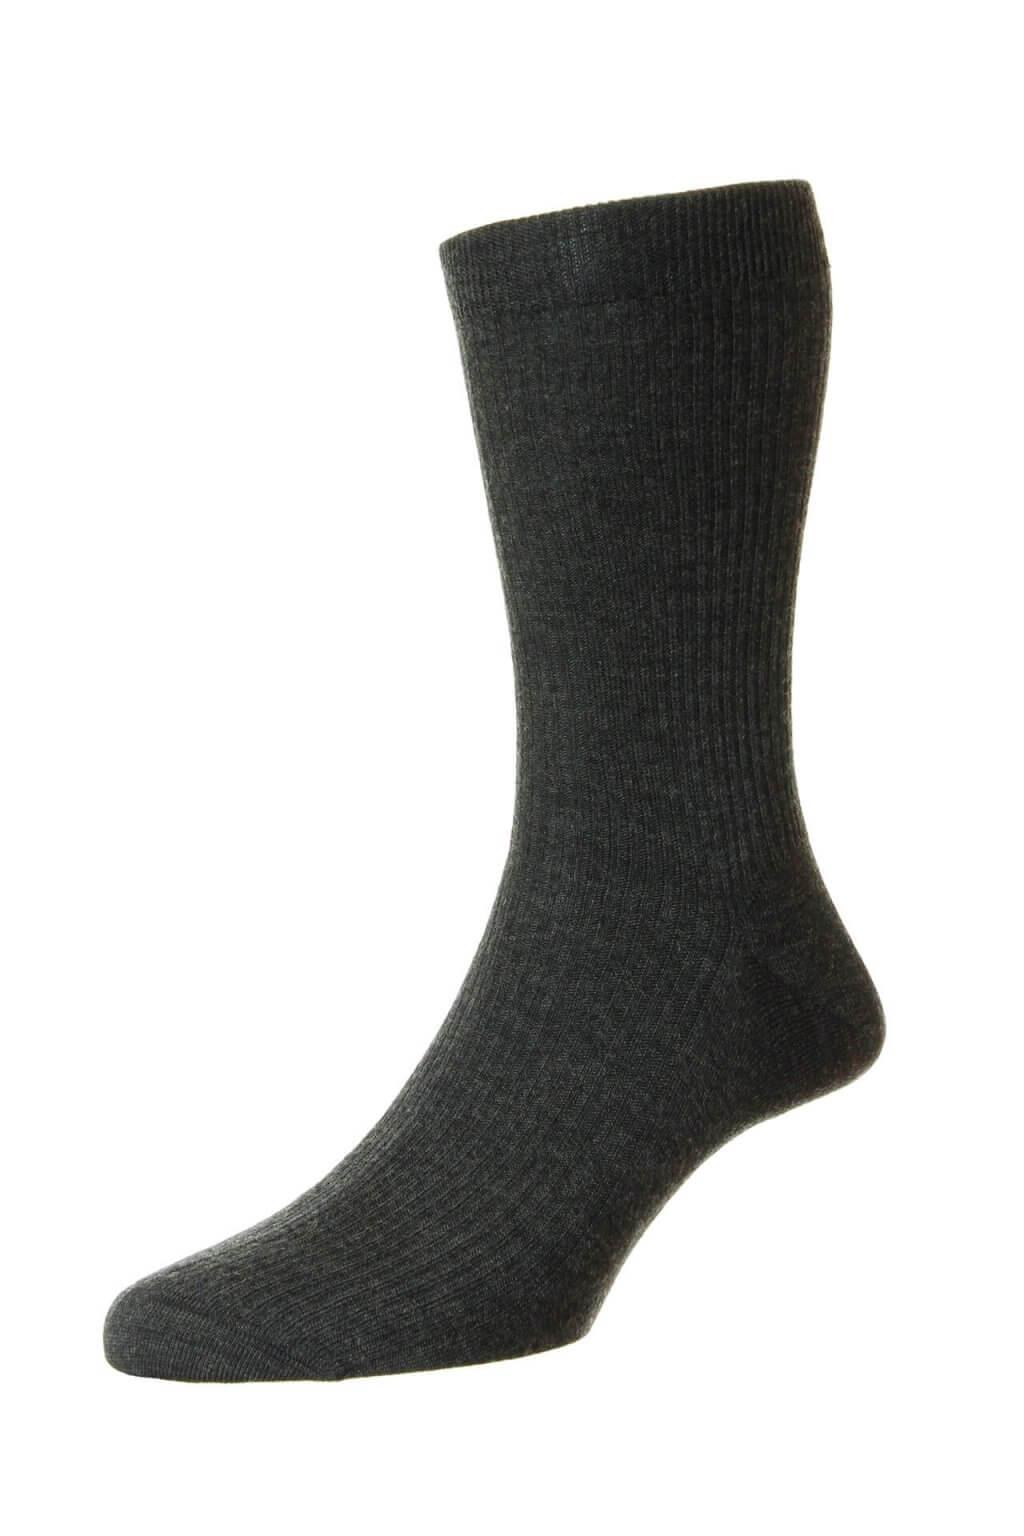 Pantherella Socks   Davids Of Haslemere